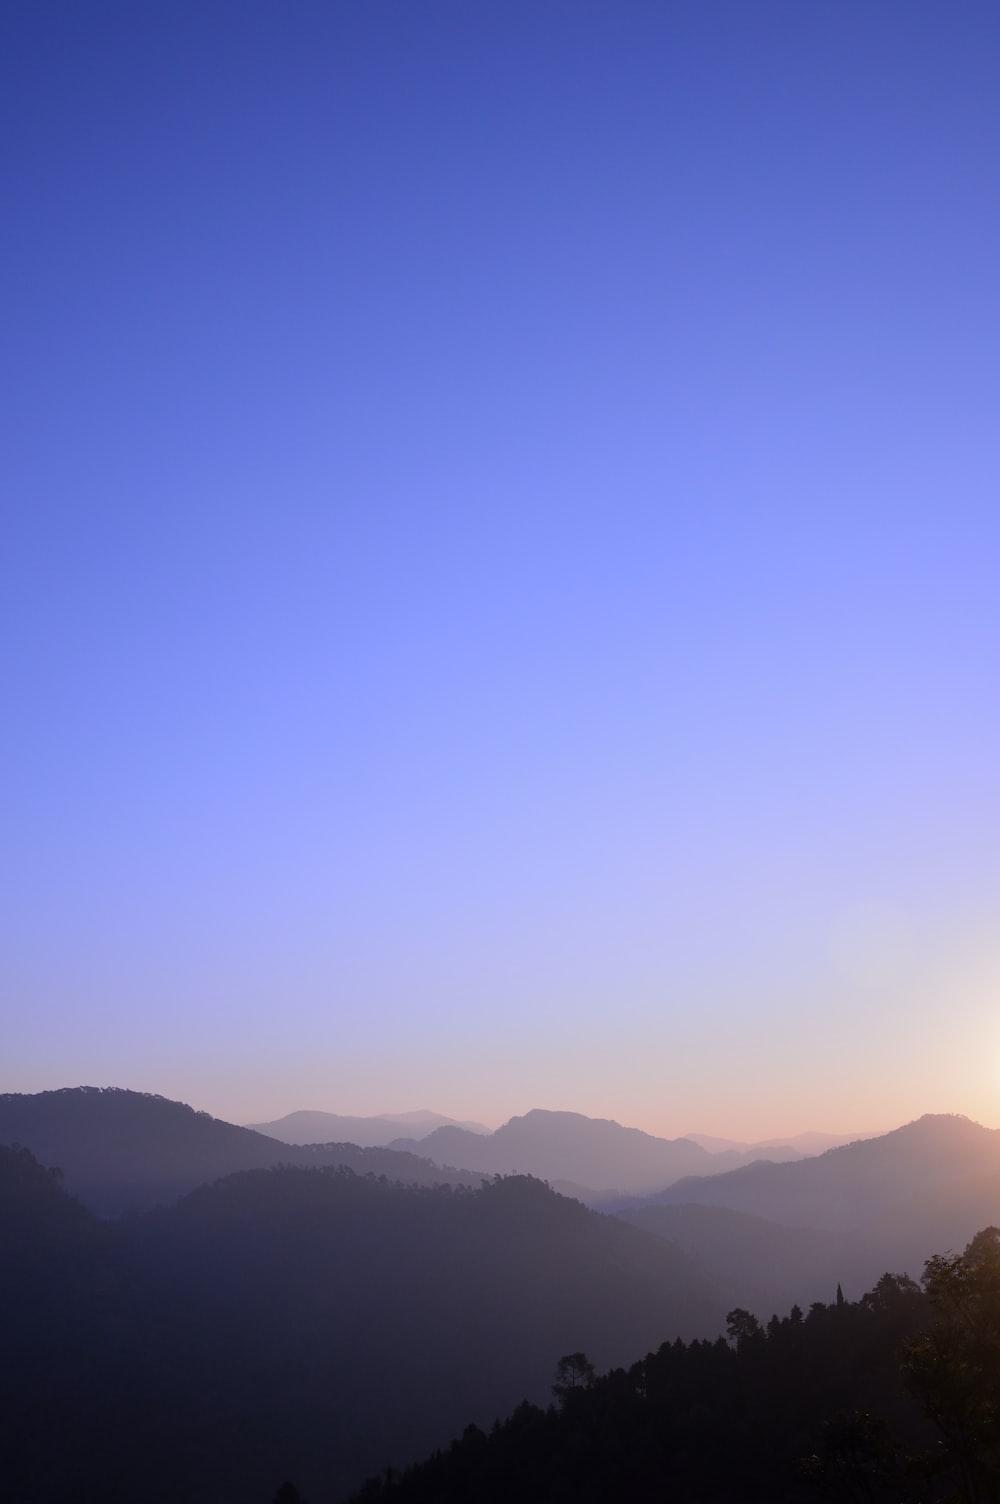 mountain ridge with fog